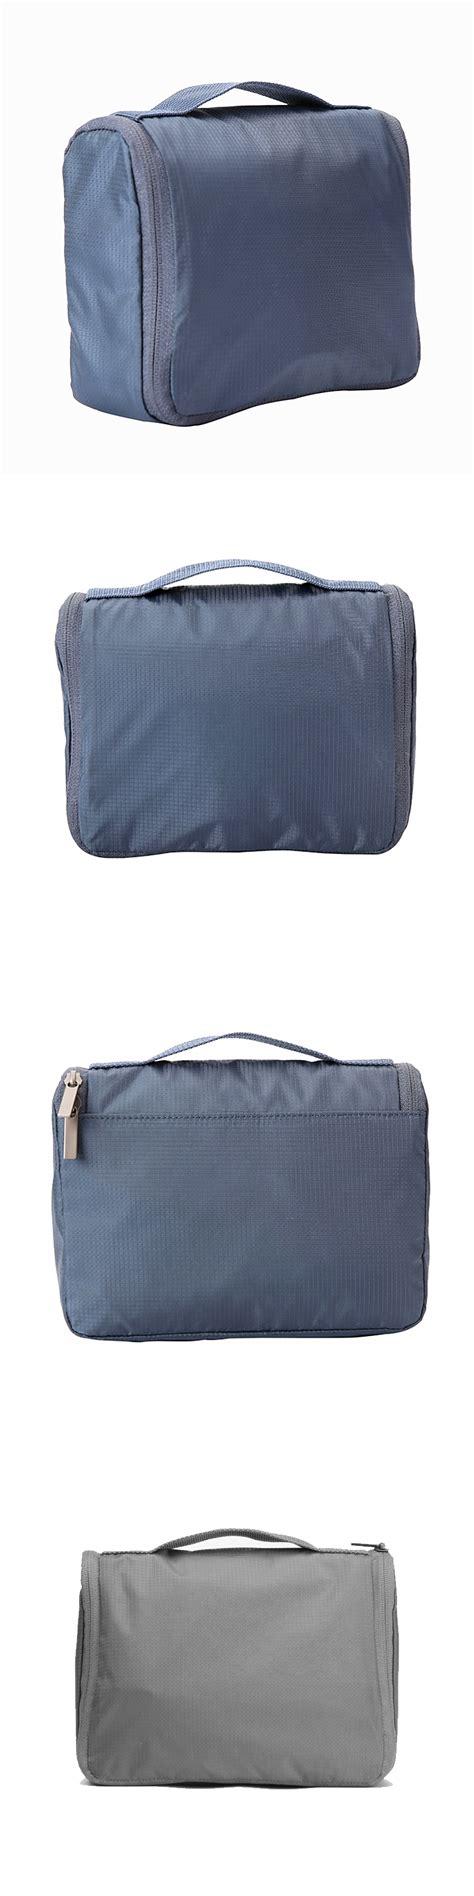 Original Xiaomi Travel Toiletry Bag Multifungsi Portable Hanging T19 Xiaomi Travel Toiletry Bag Multifunction Portable Travel